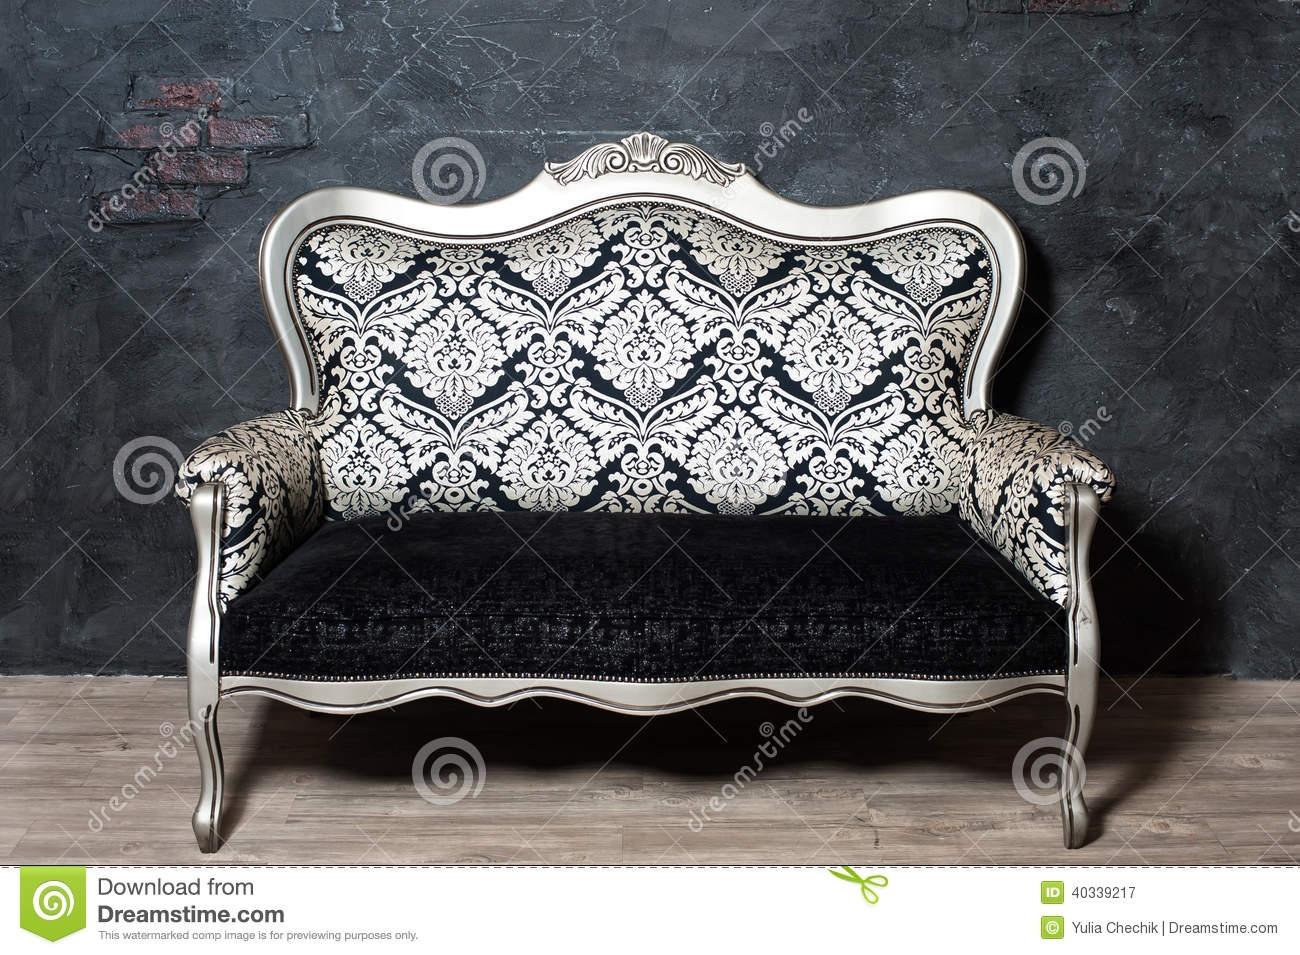 Old Fashioned Sofa Stock Photo Image 40339217 Pertaining To Old Fashioned Sofas (Image 5 of 15)